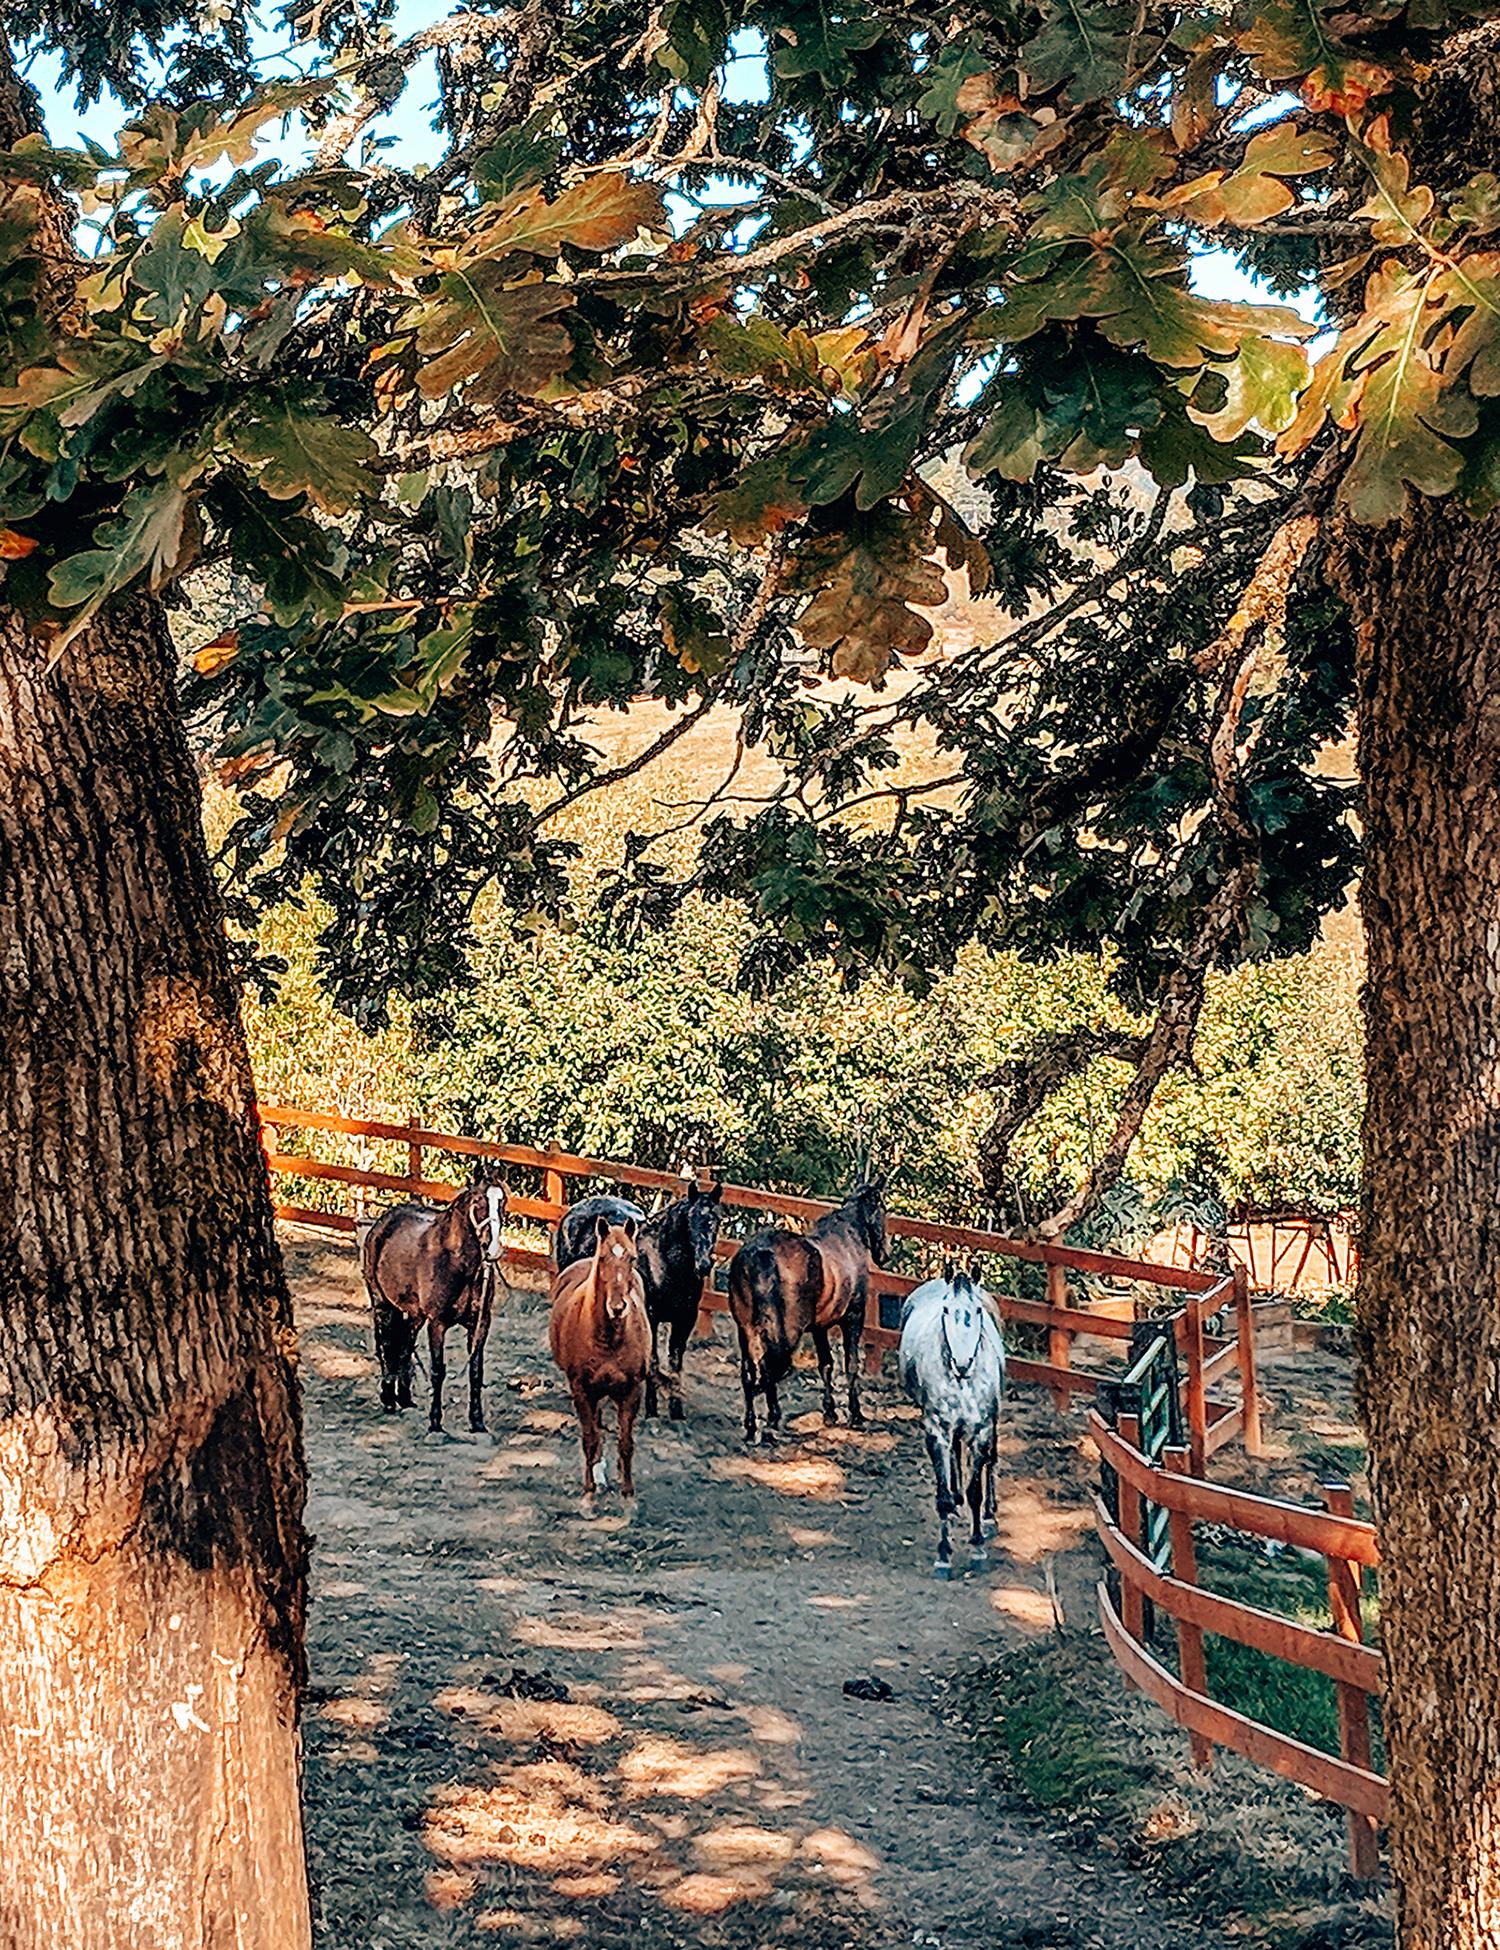 Adelsheim horses